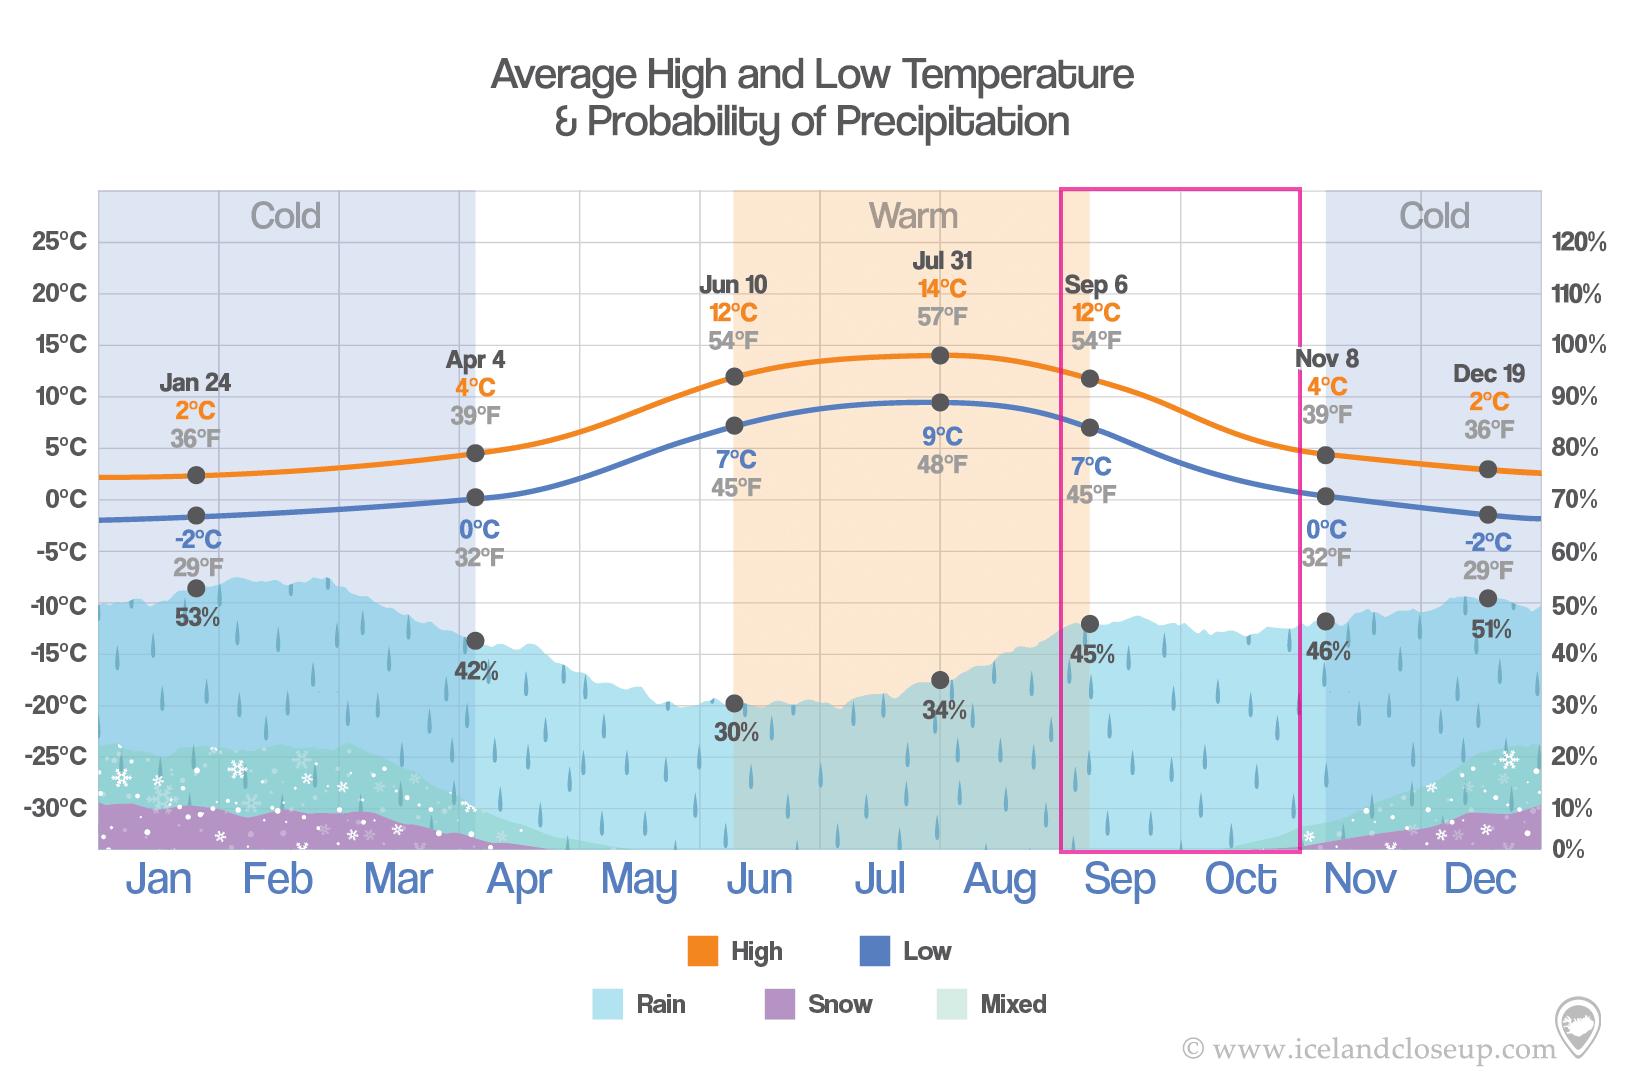 Iceland Temperature and precipition in Fall